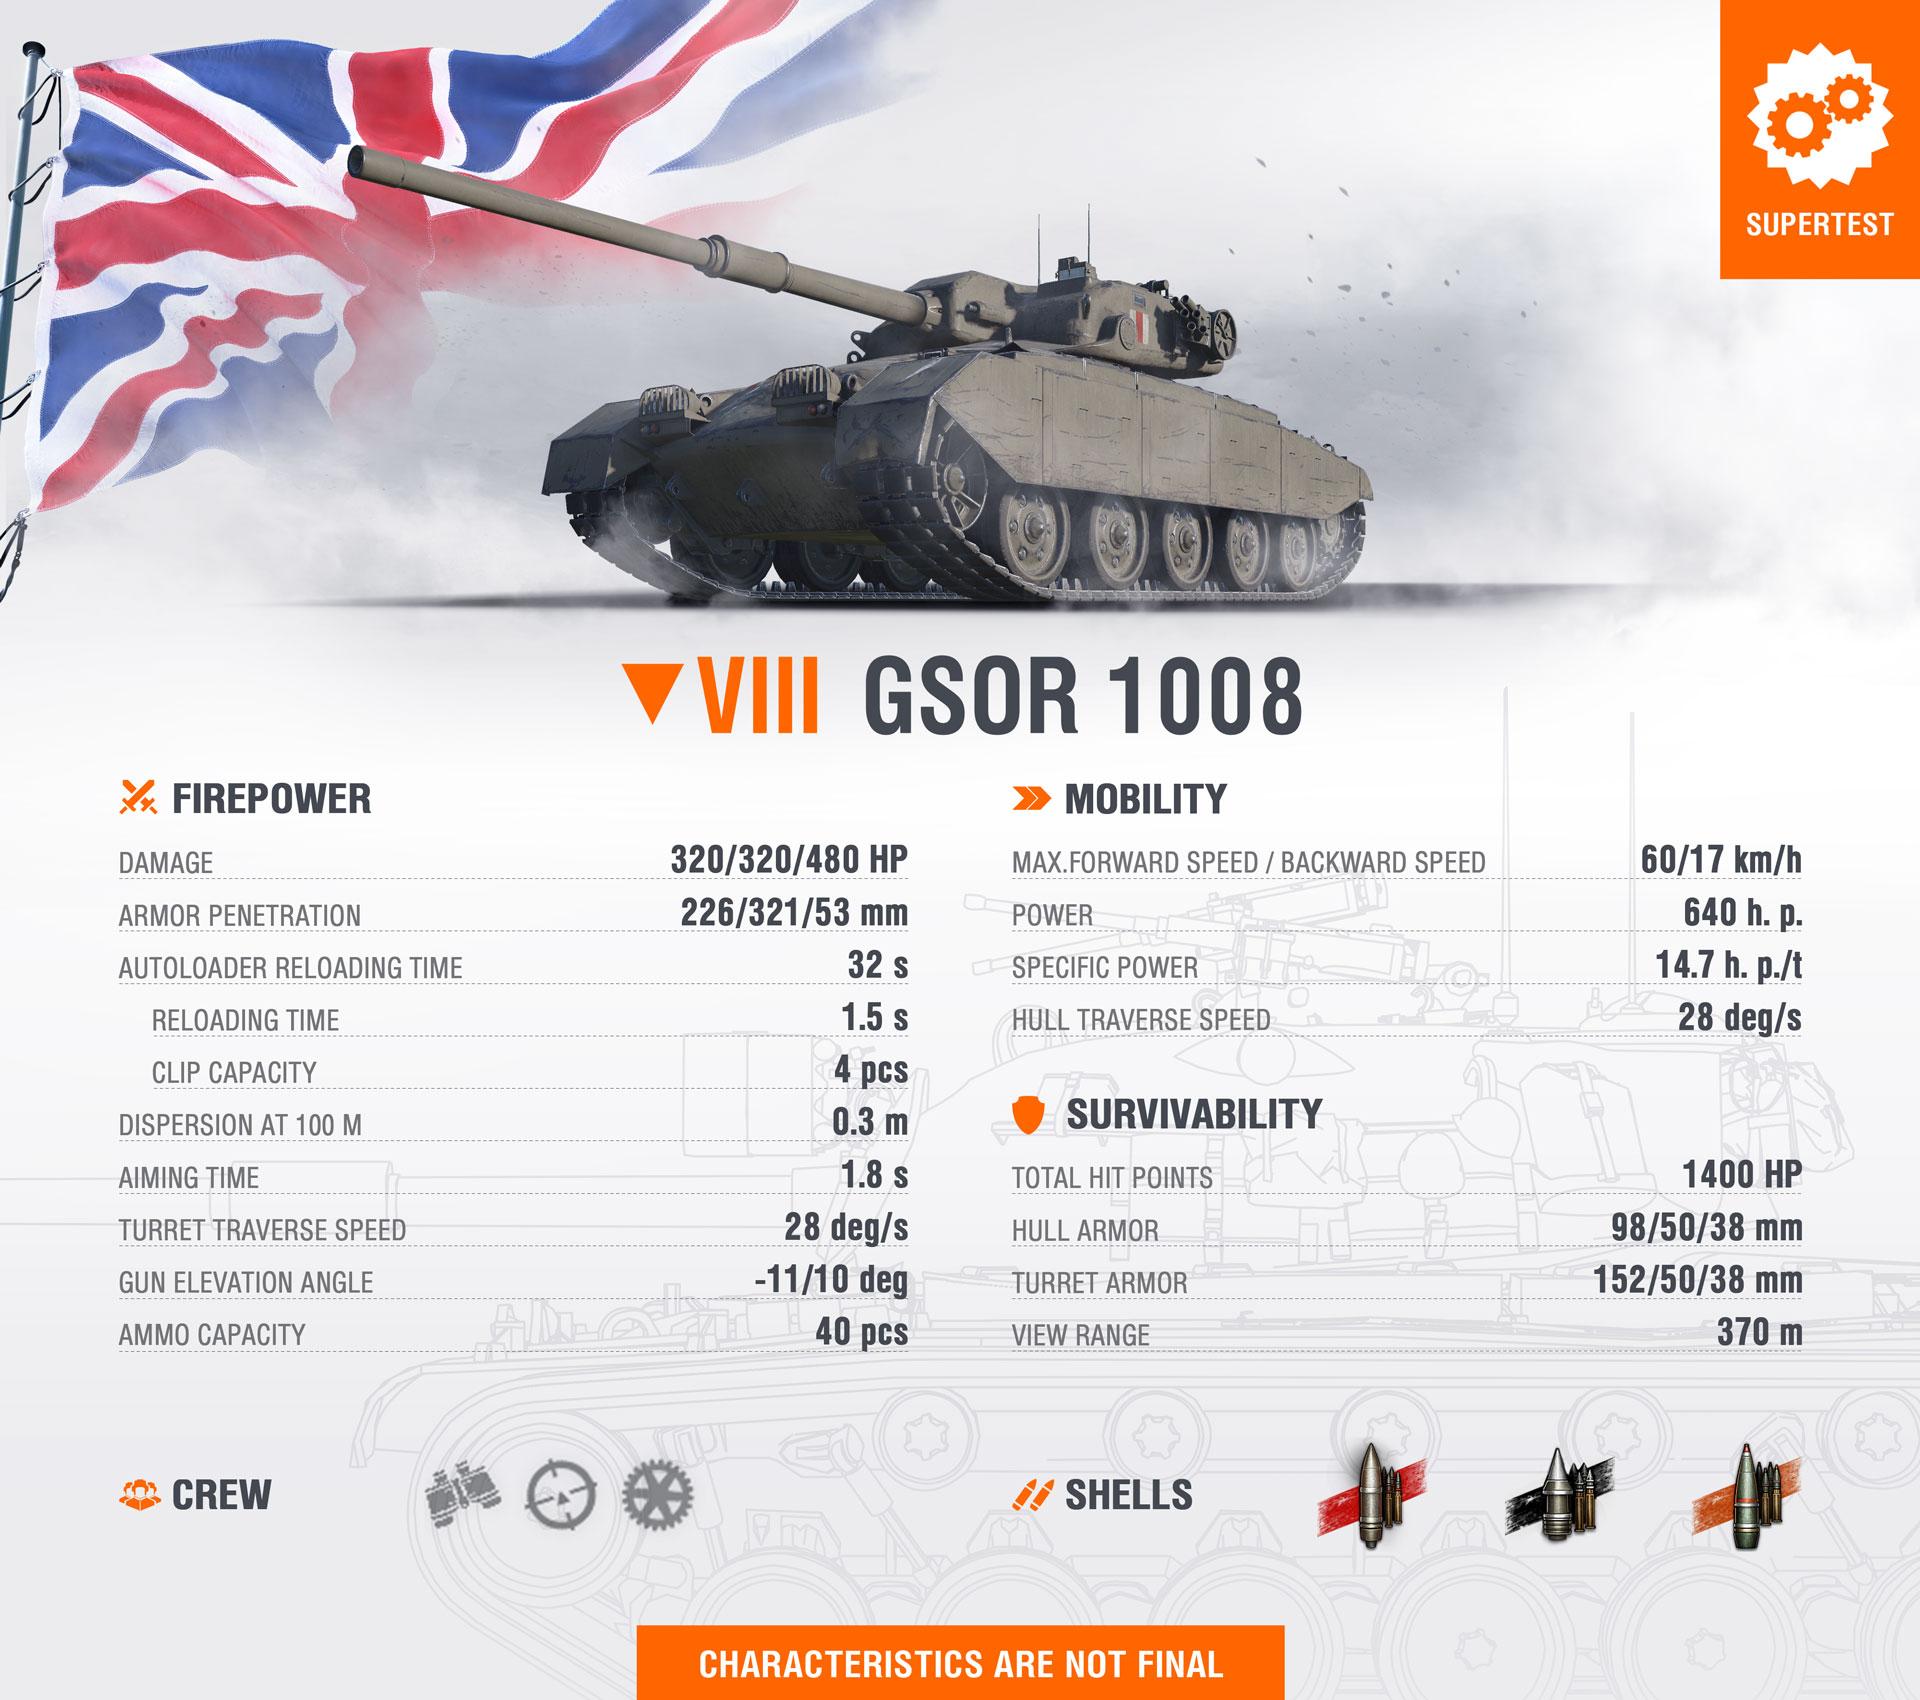 WoT_Template_New_Tank_GSOR_1008_EN.jpg